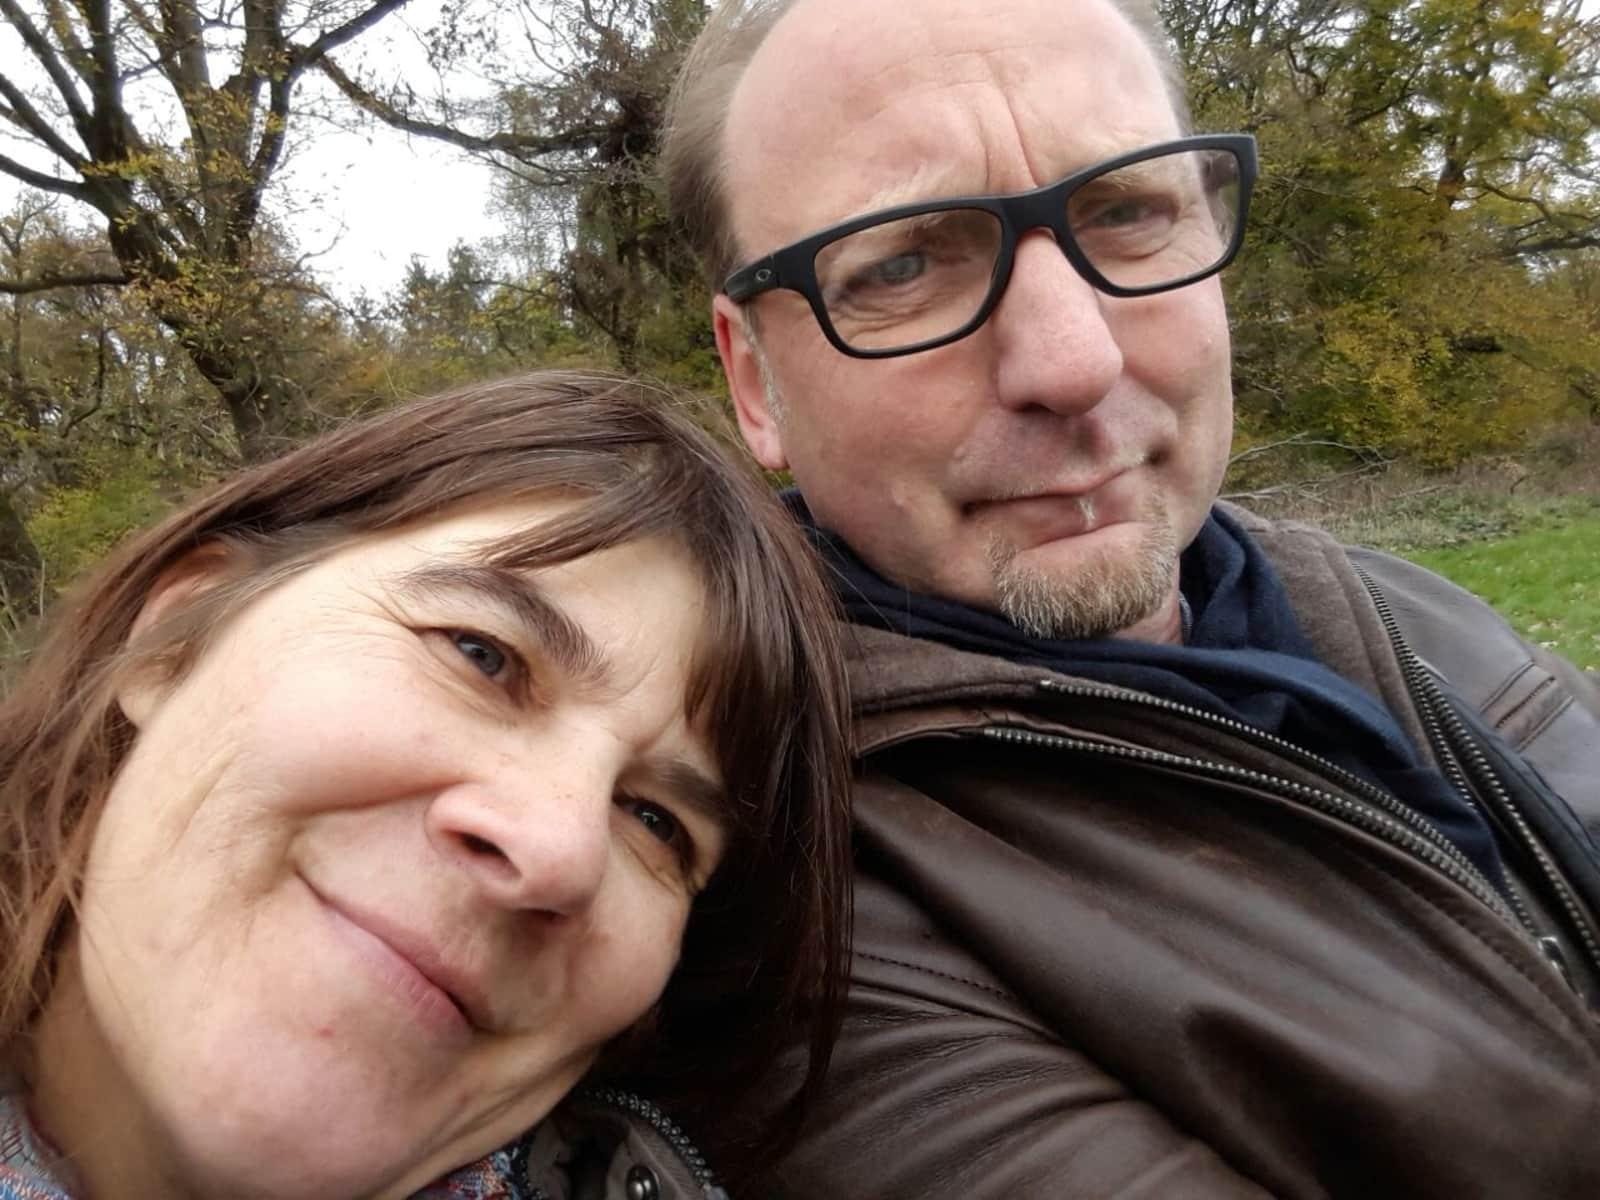 Ilona & Erik from Taunusstein, Germany